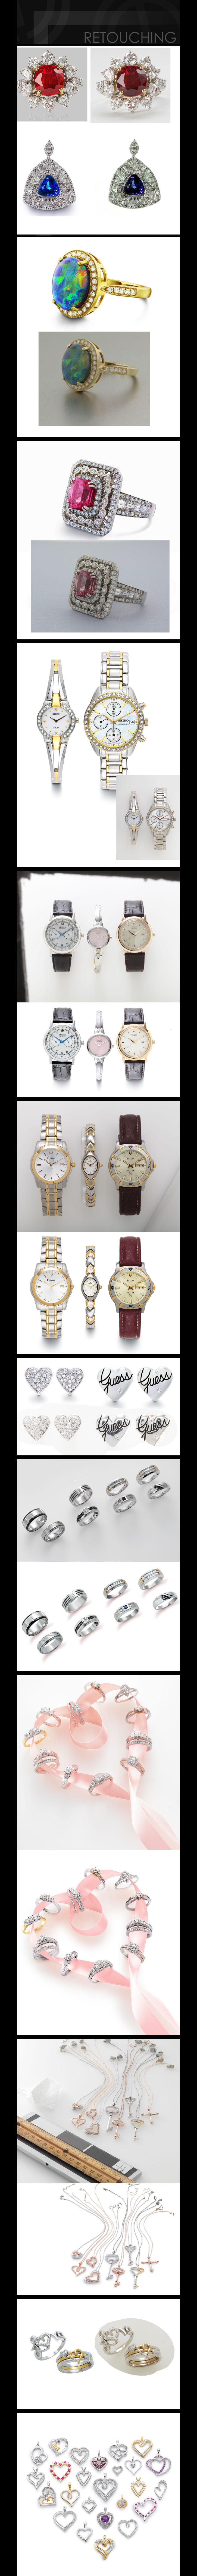 jewelry retouch color diamond  photoshop